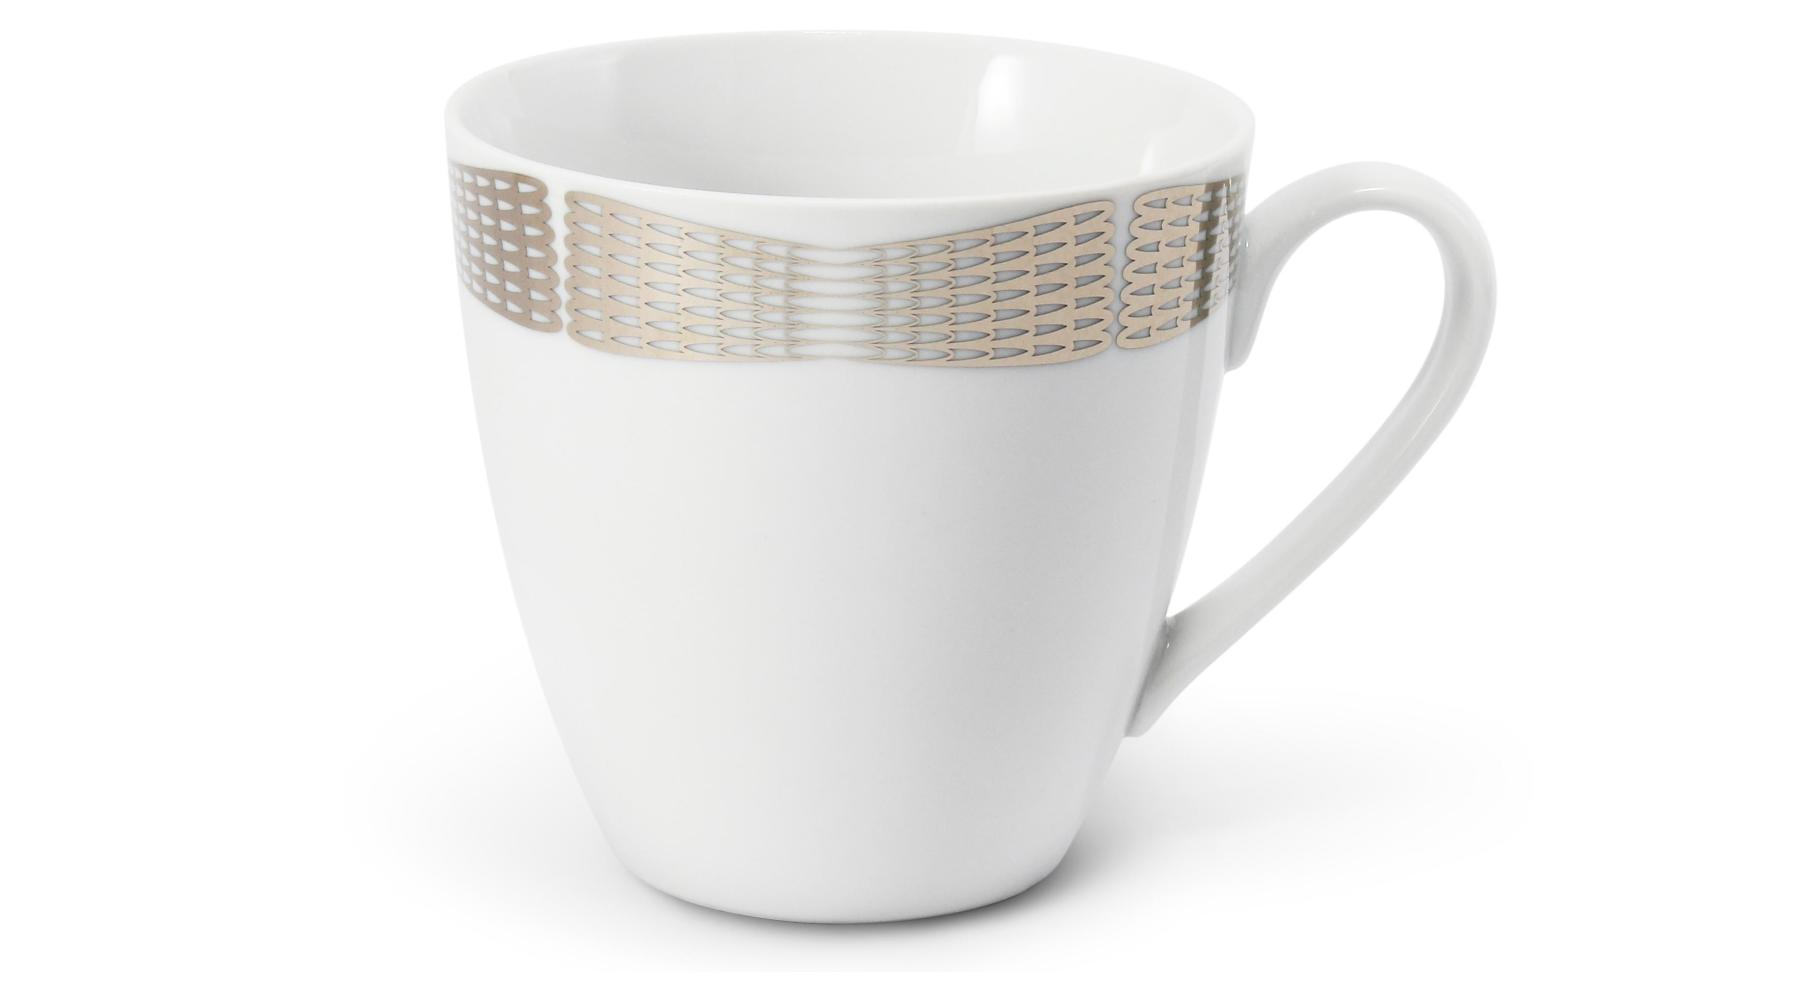 Tasse 0,3l Silberne Engelsflügel